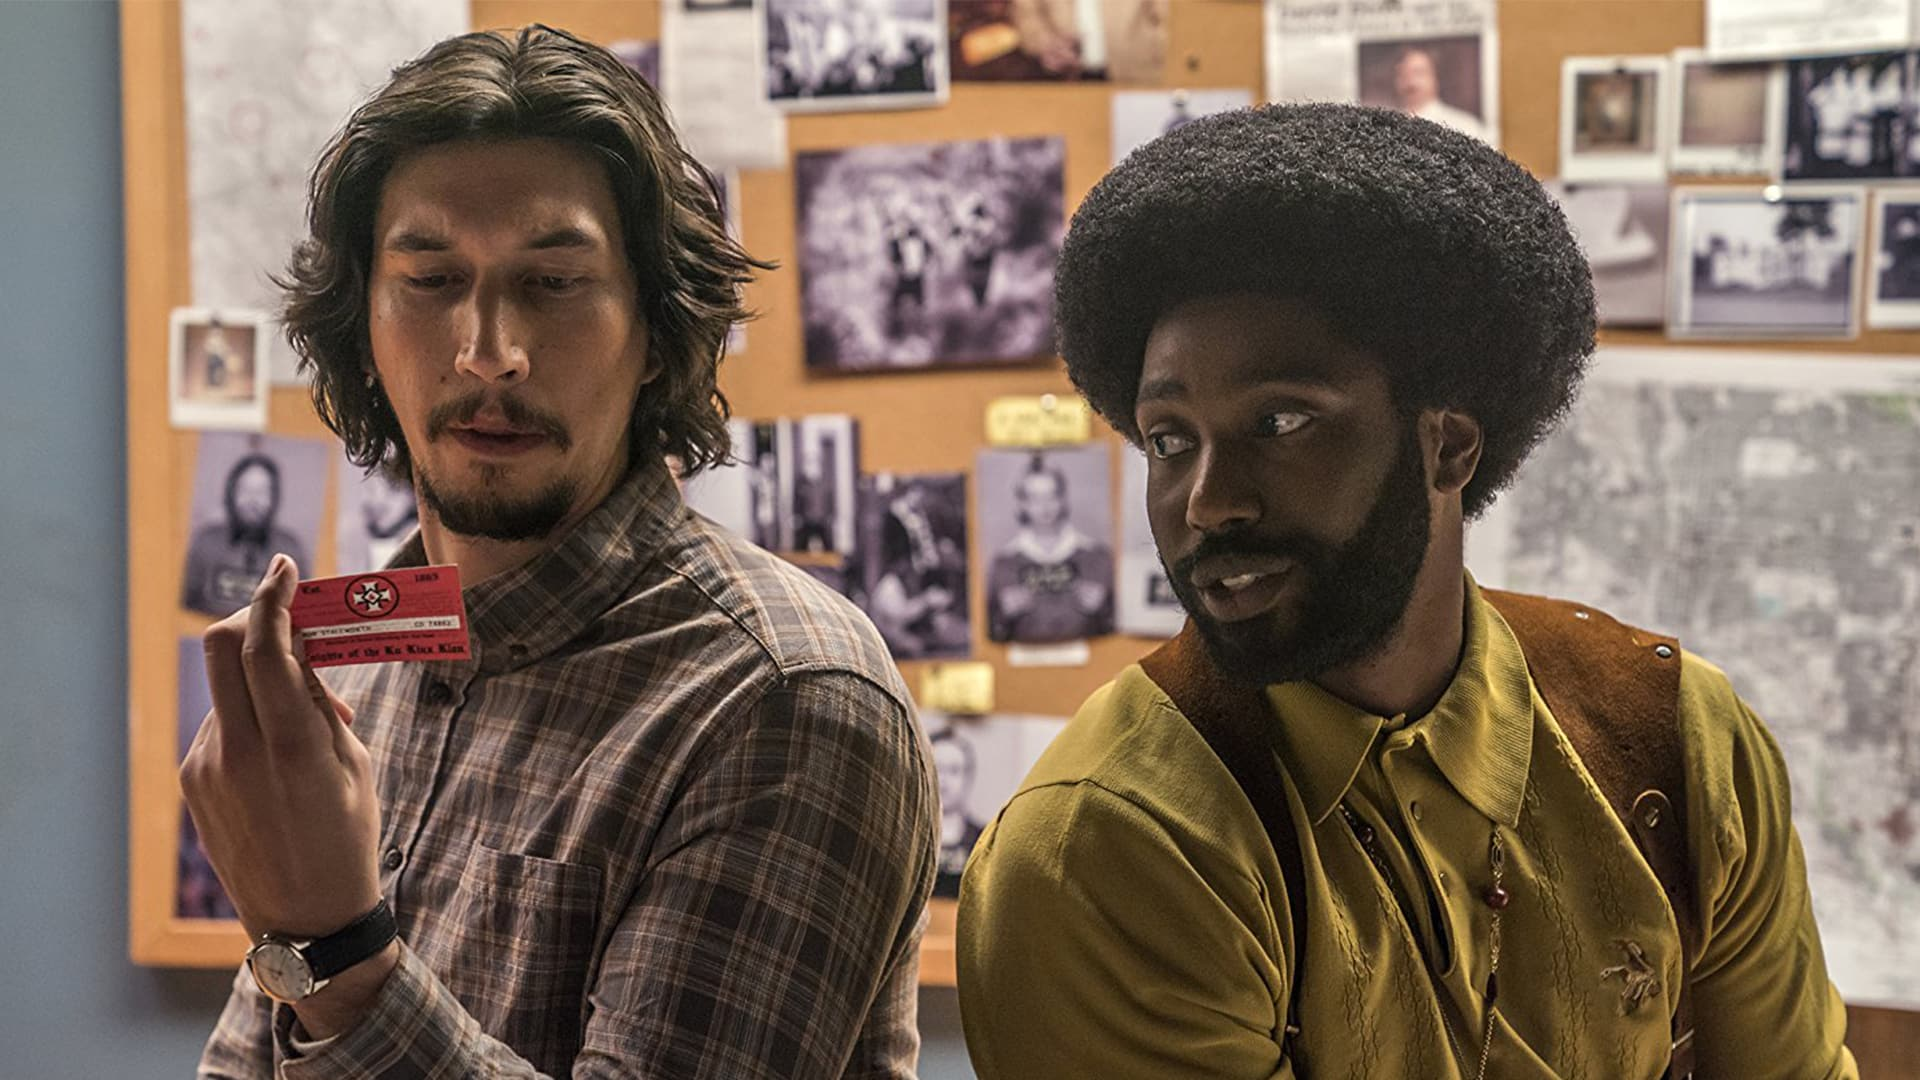 BlacKkKlansman provokatívne približuje problematiku rasizmu